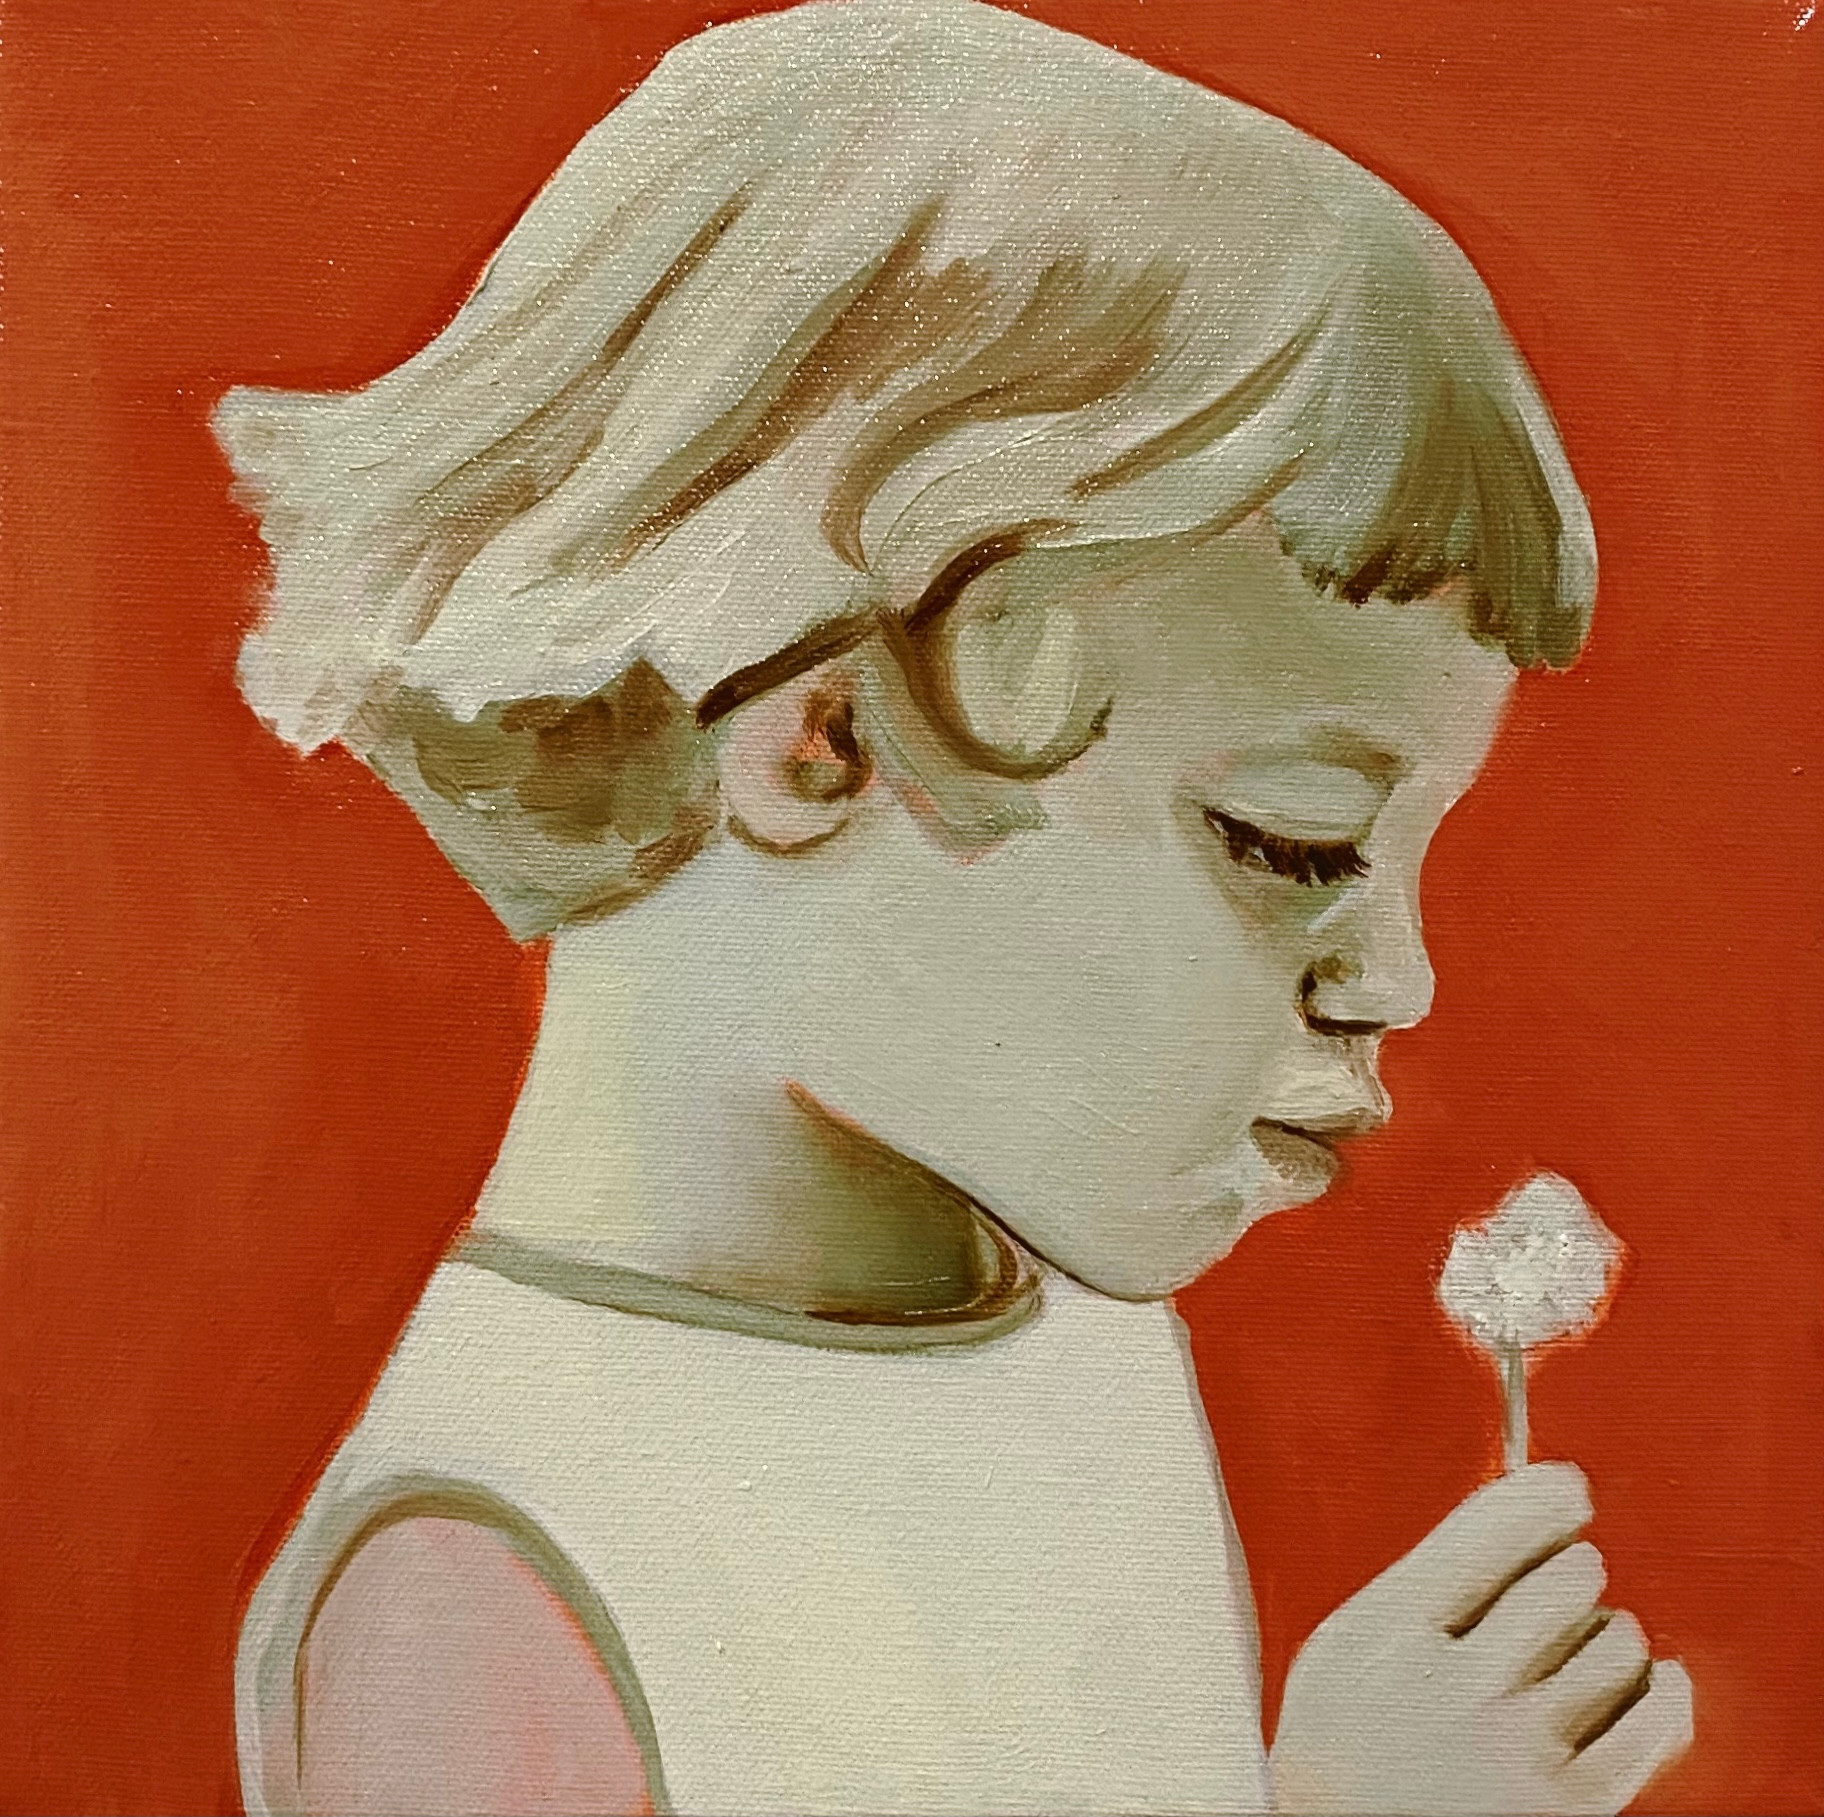 Bittersweeet, oil on canvas, 25 x 25 cm